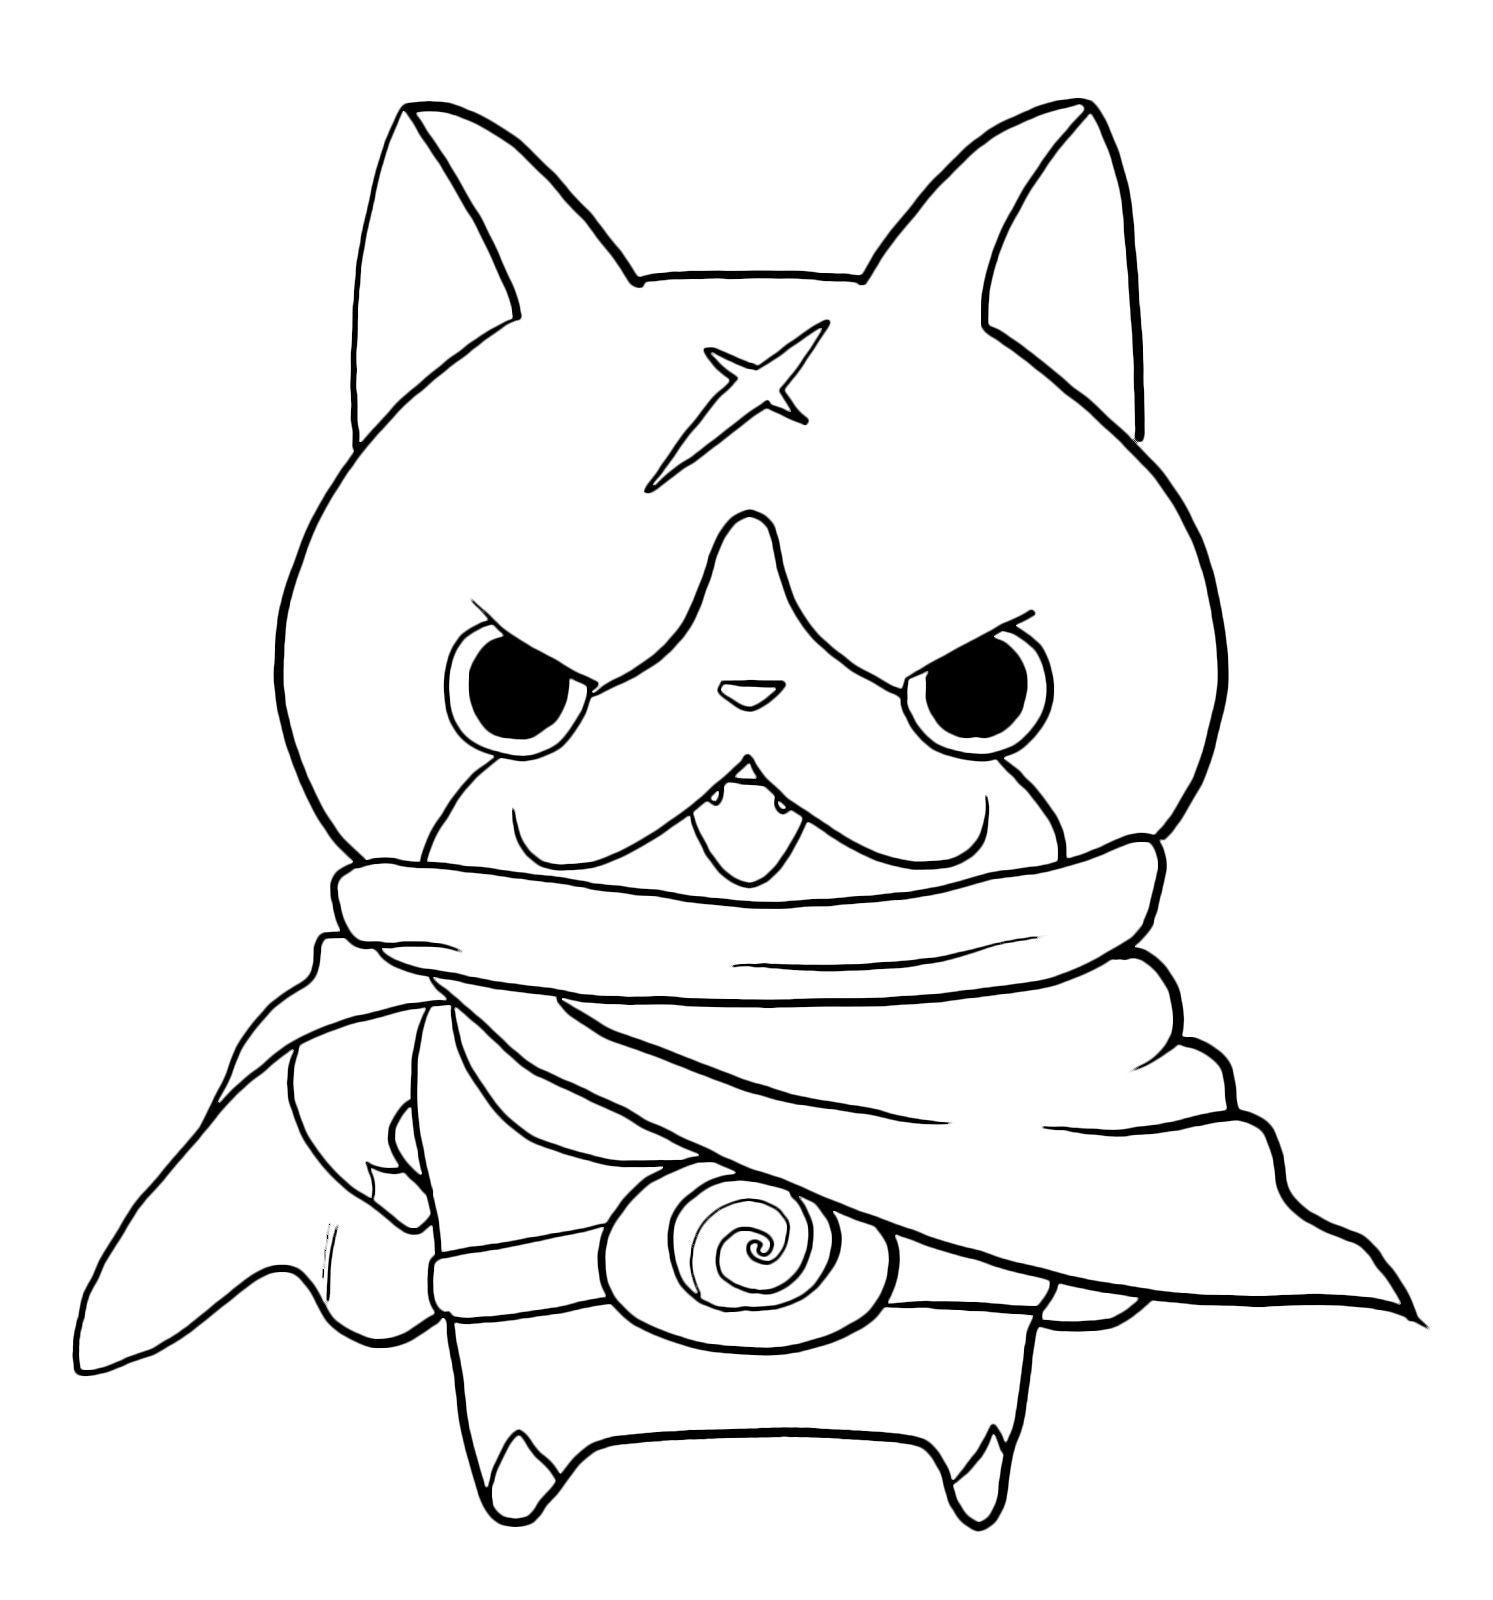 Yo Kai Watch Coloring Pages New Kai Coloring Pages Enjoyforfunte Kai